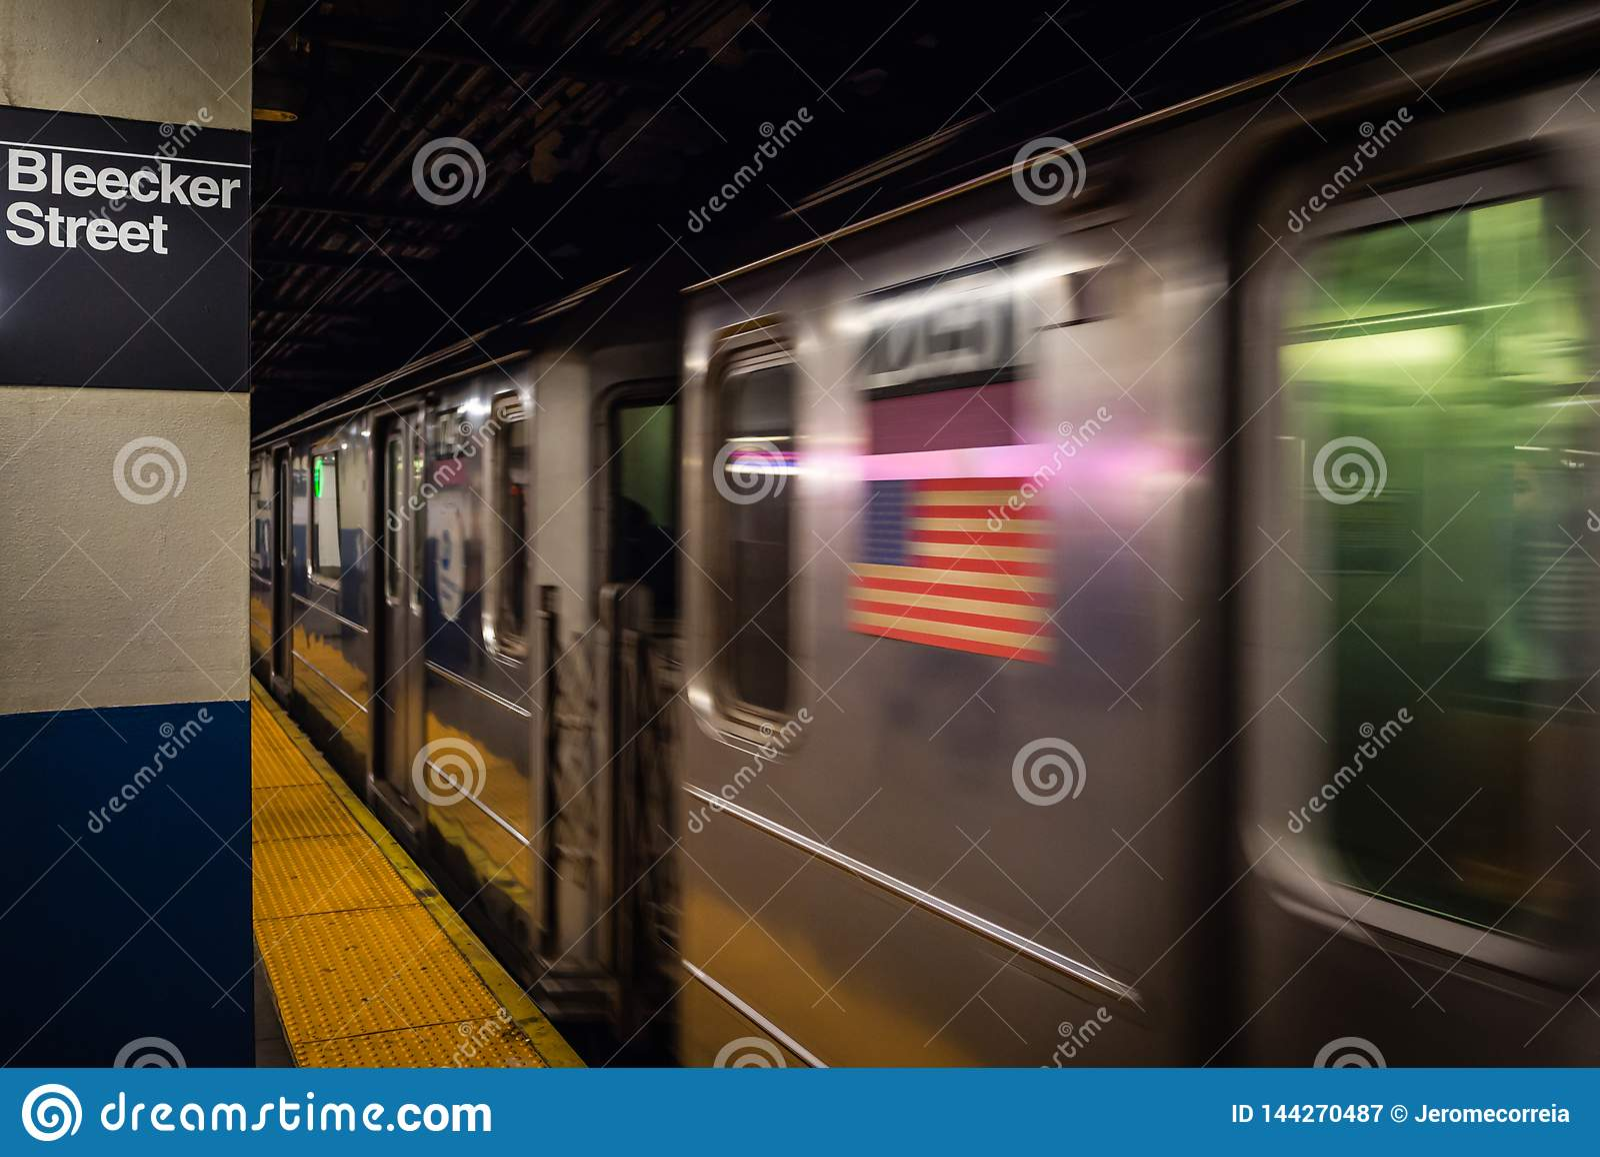 New York City, USA - 23. FEBRUAR 2018: Die U-Bahnstation in der Bleecker-Straßenstation in NYC